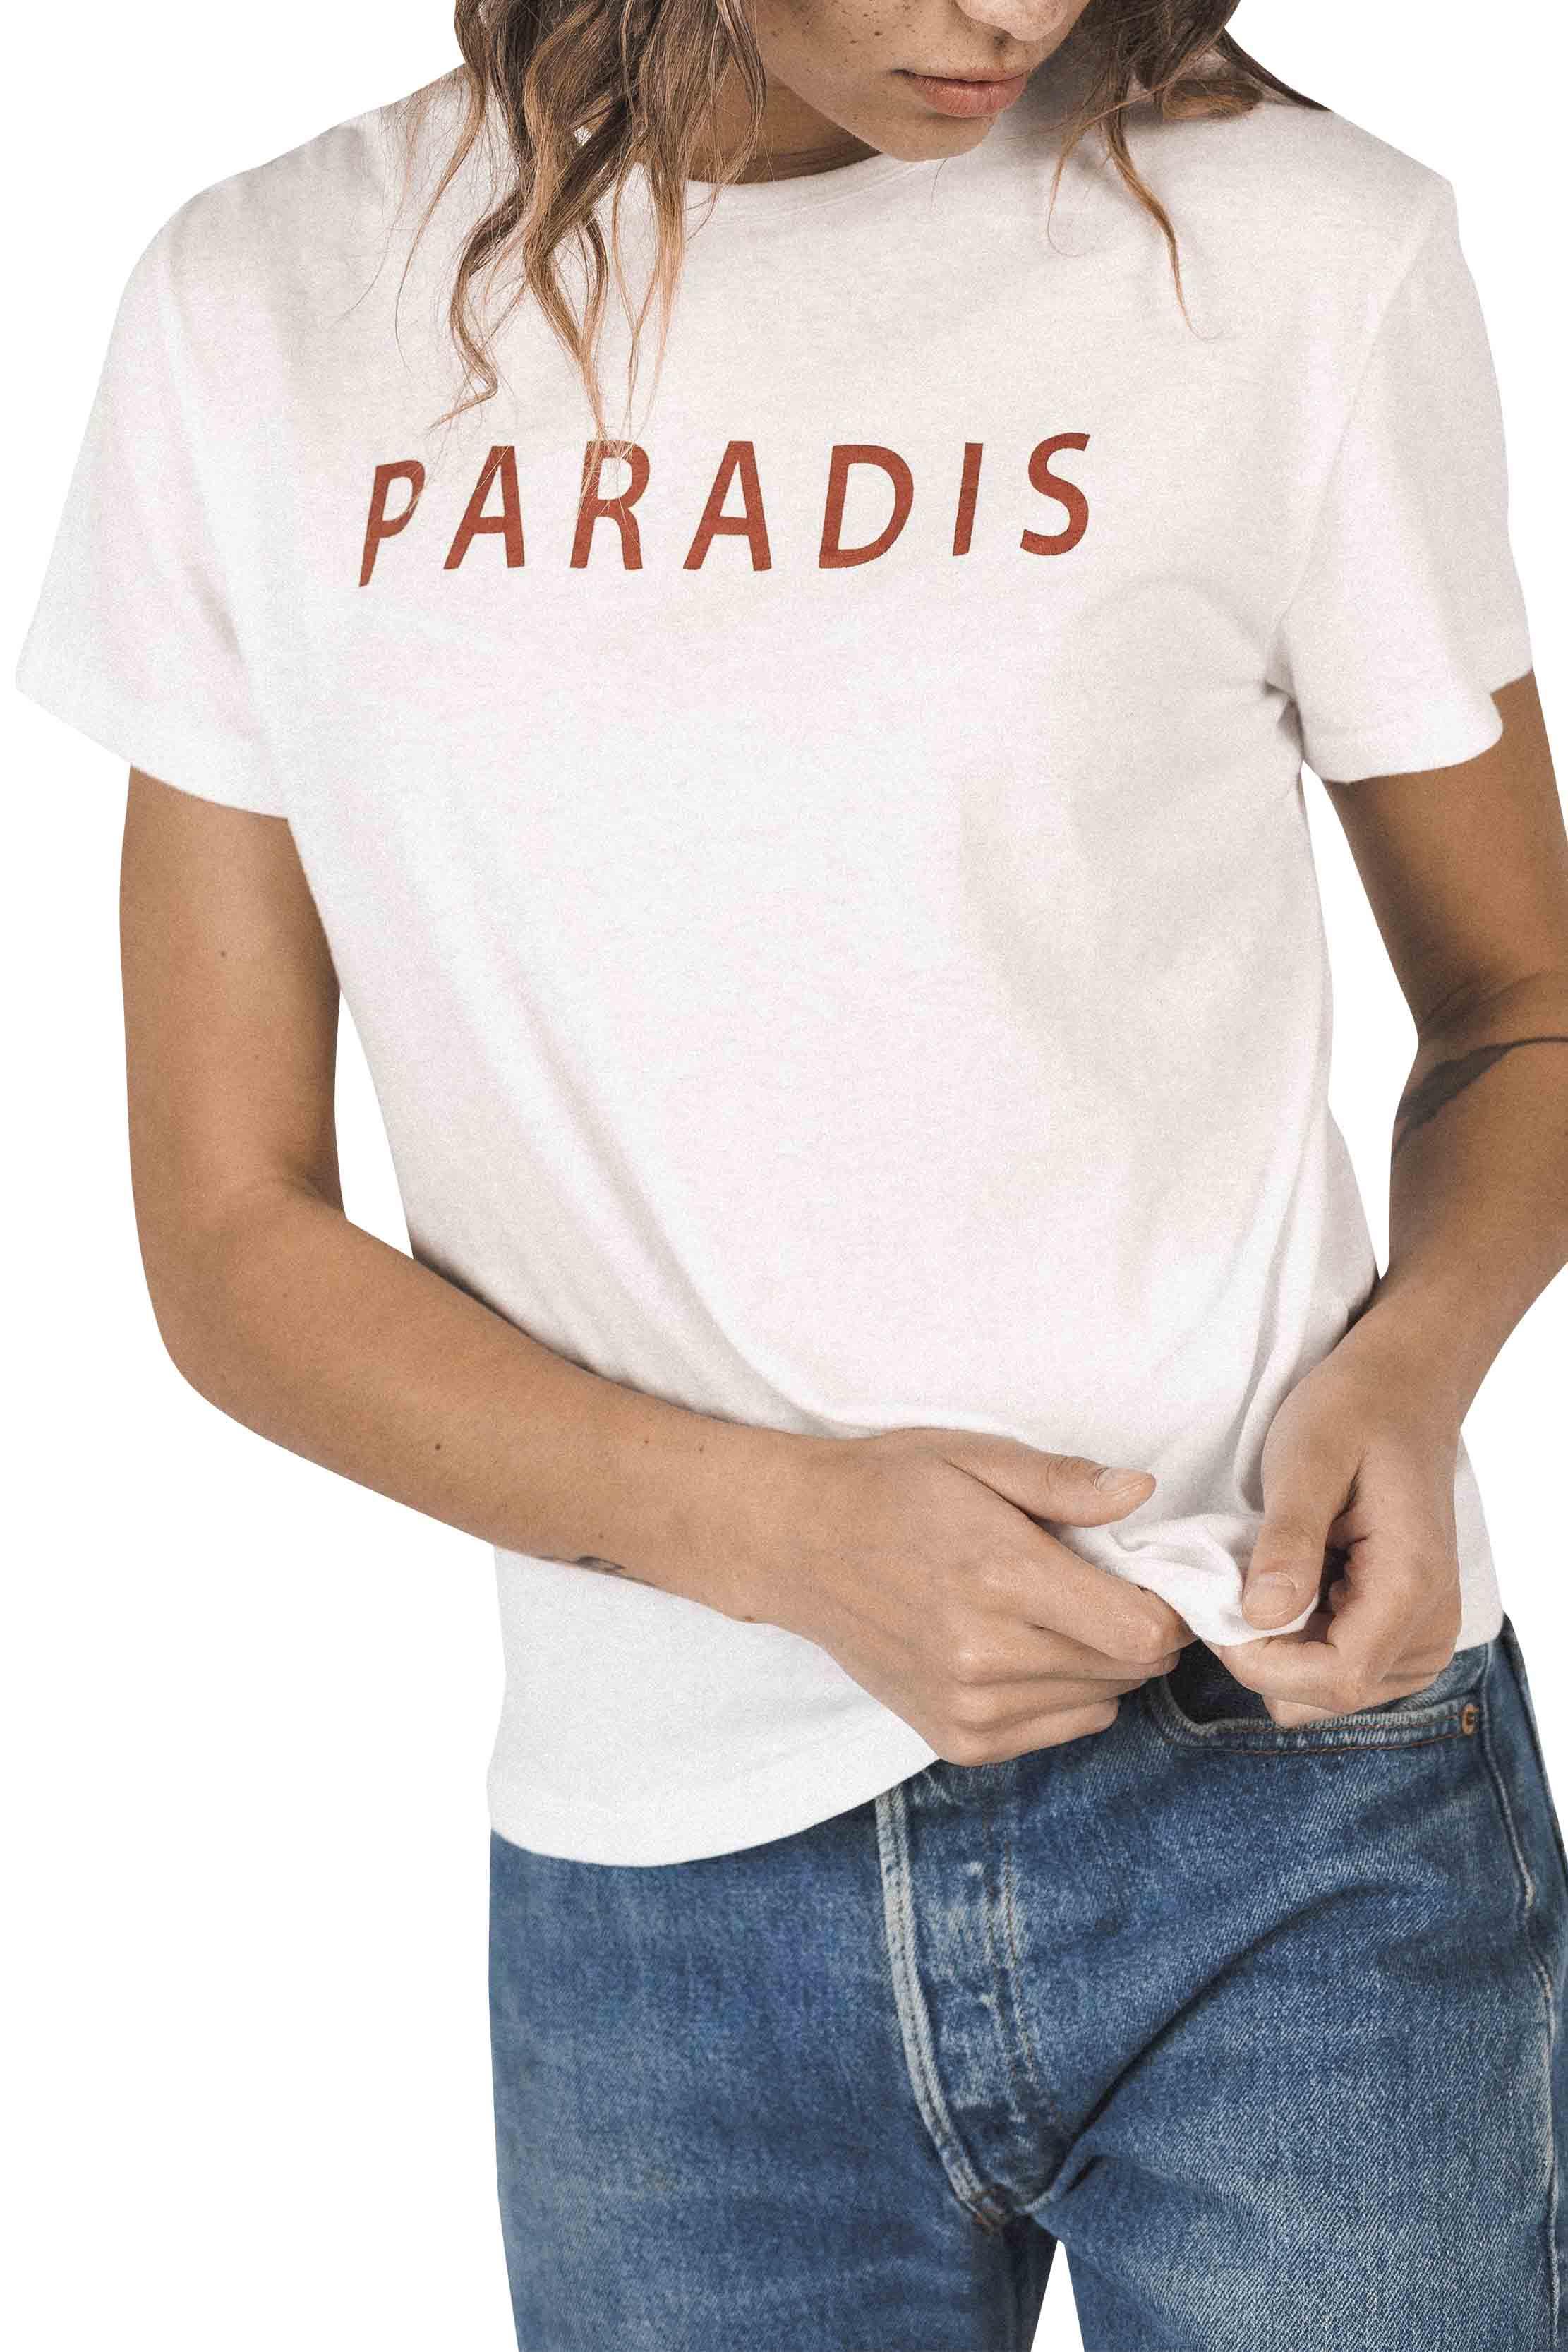 Jett T-Shirt RED WHITE PARADIS by Trovata - 1